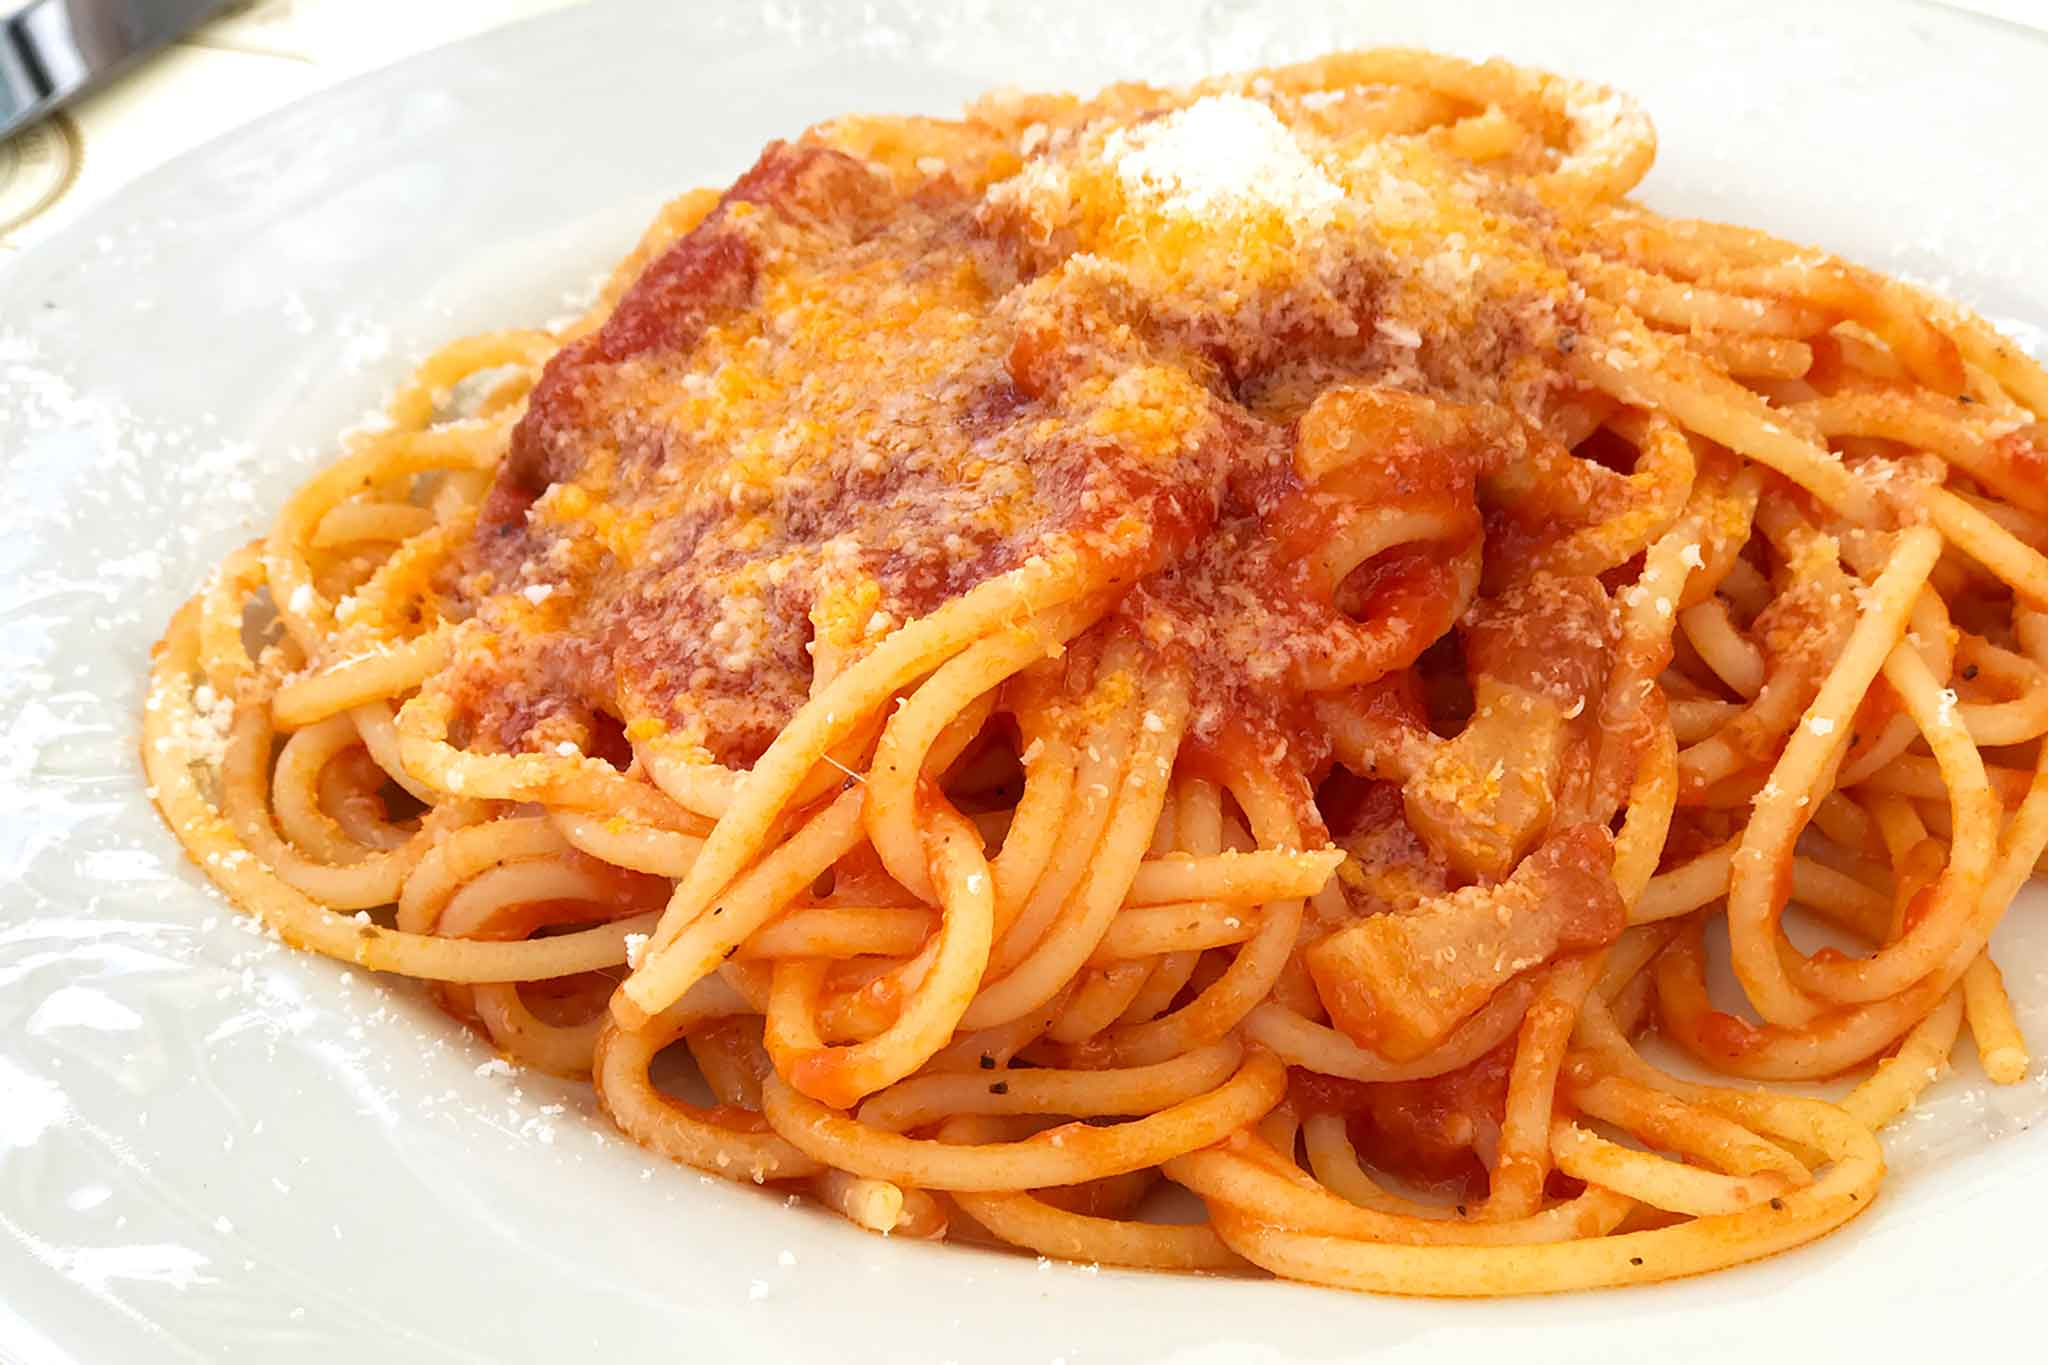 Amatriciana ristorante roma